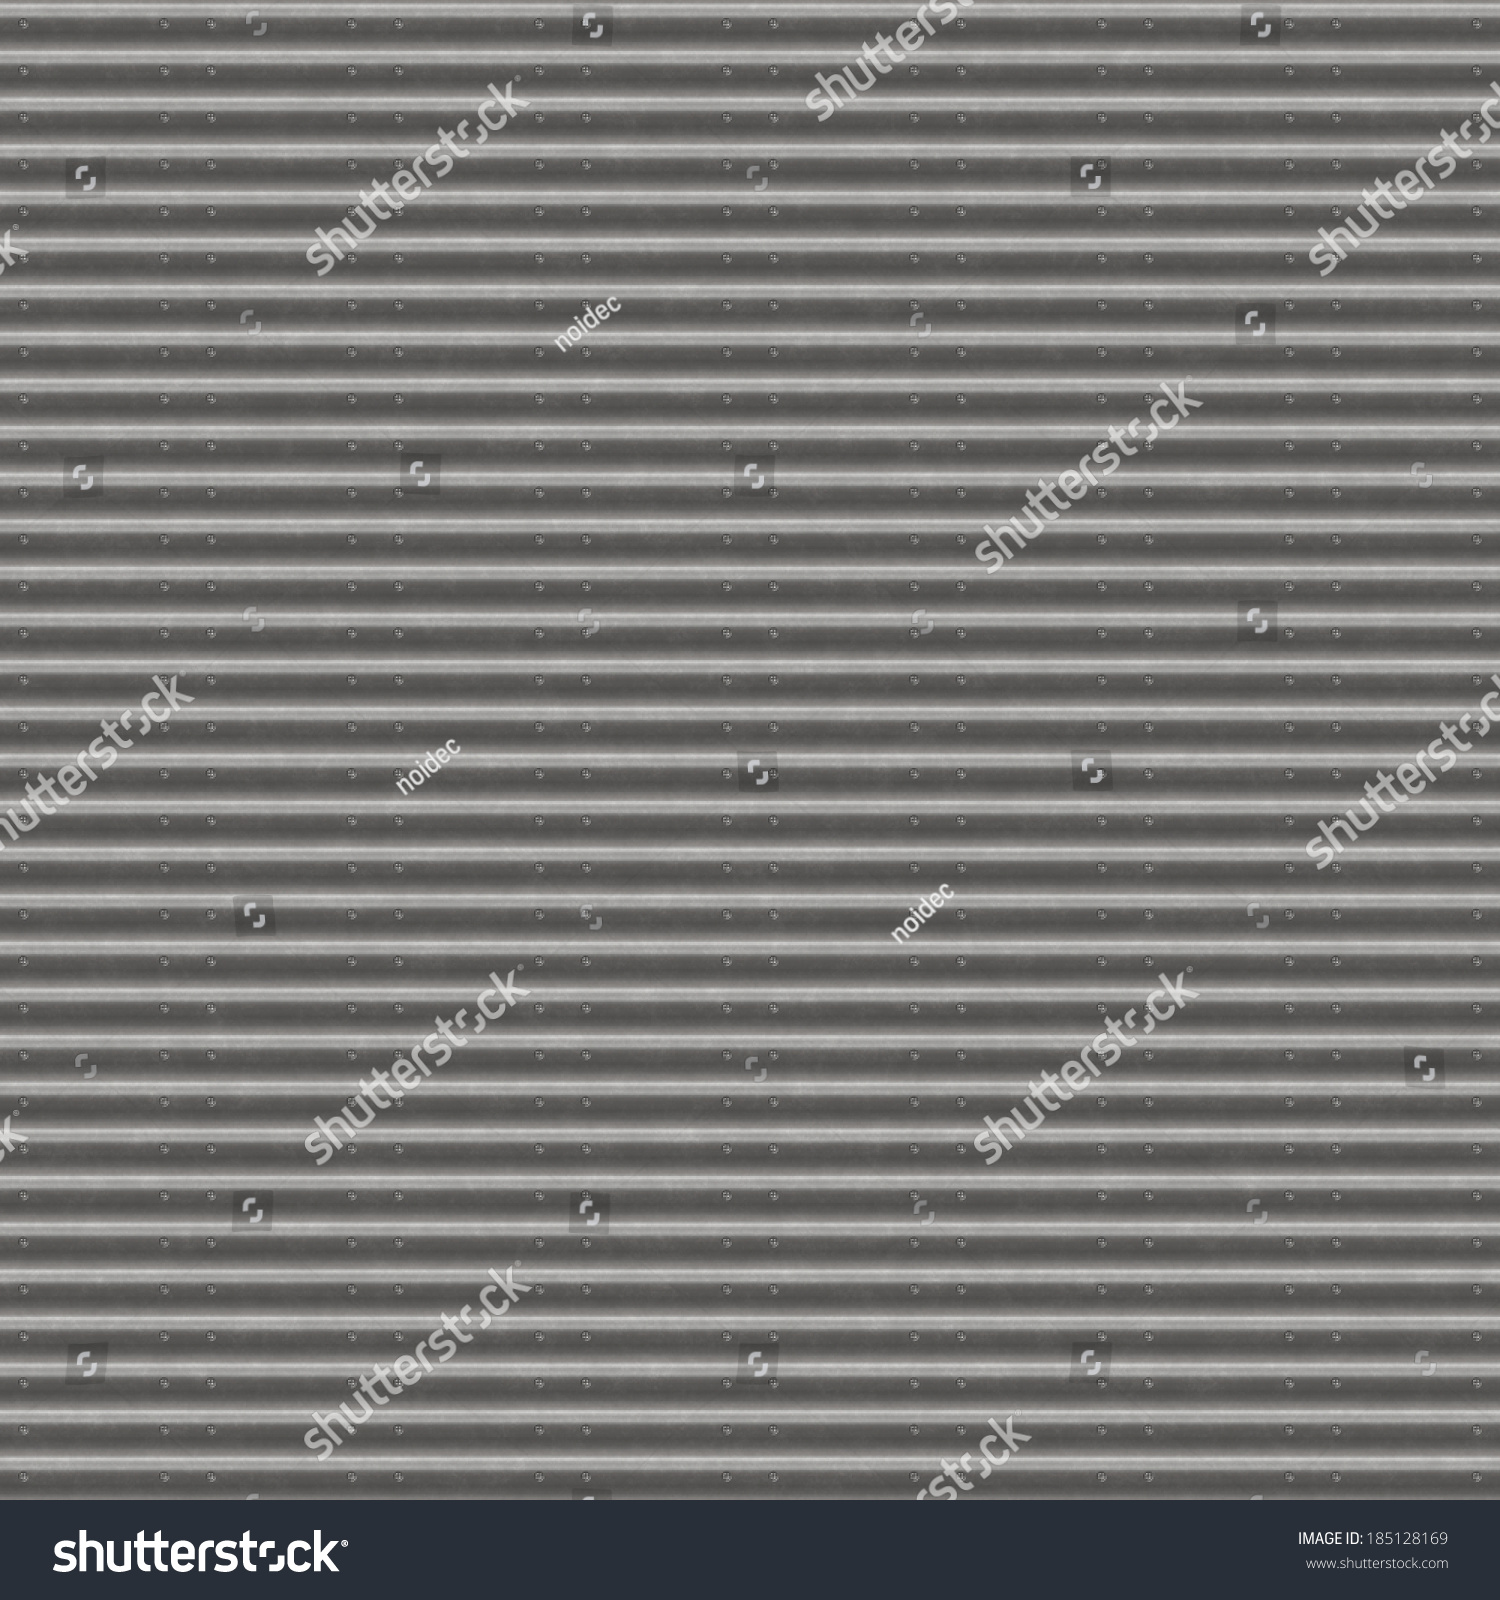 Seamless metal wall texture Rustic Metal Id 185128169 Ez Canvas Metal Wall Seamless Texture Background Ez Canvas